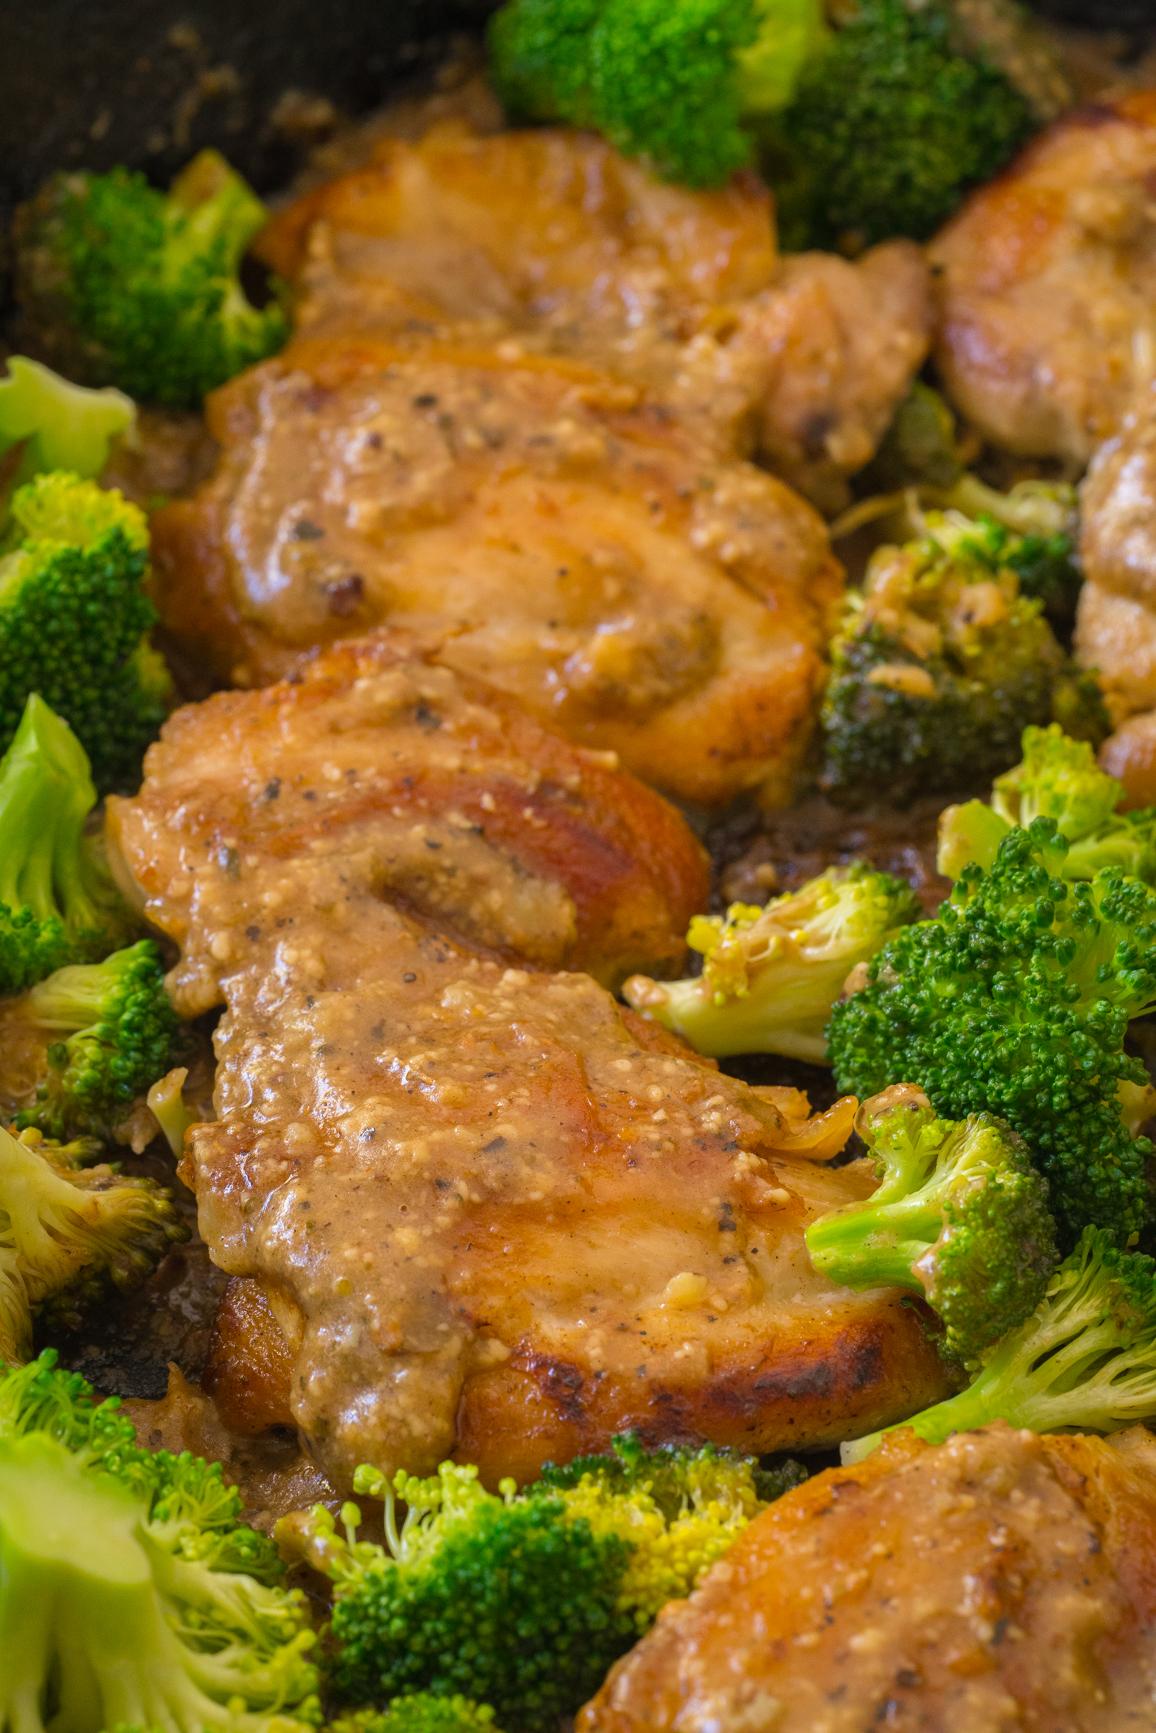 lemon_parmesan_chicken_broccoli_skillet_vertical__2_of_3_